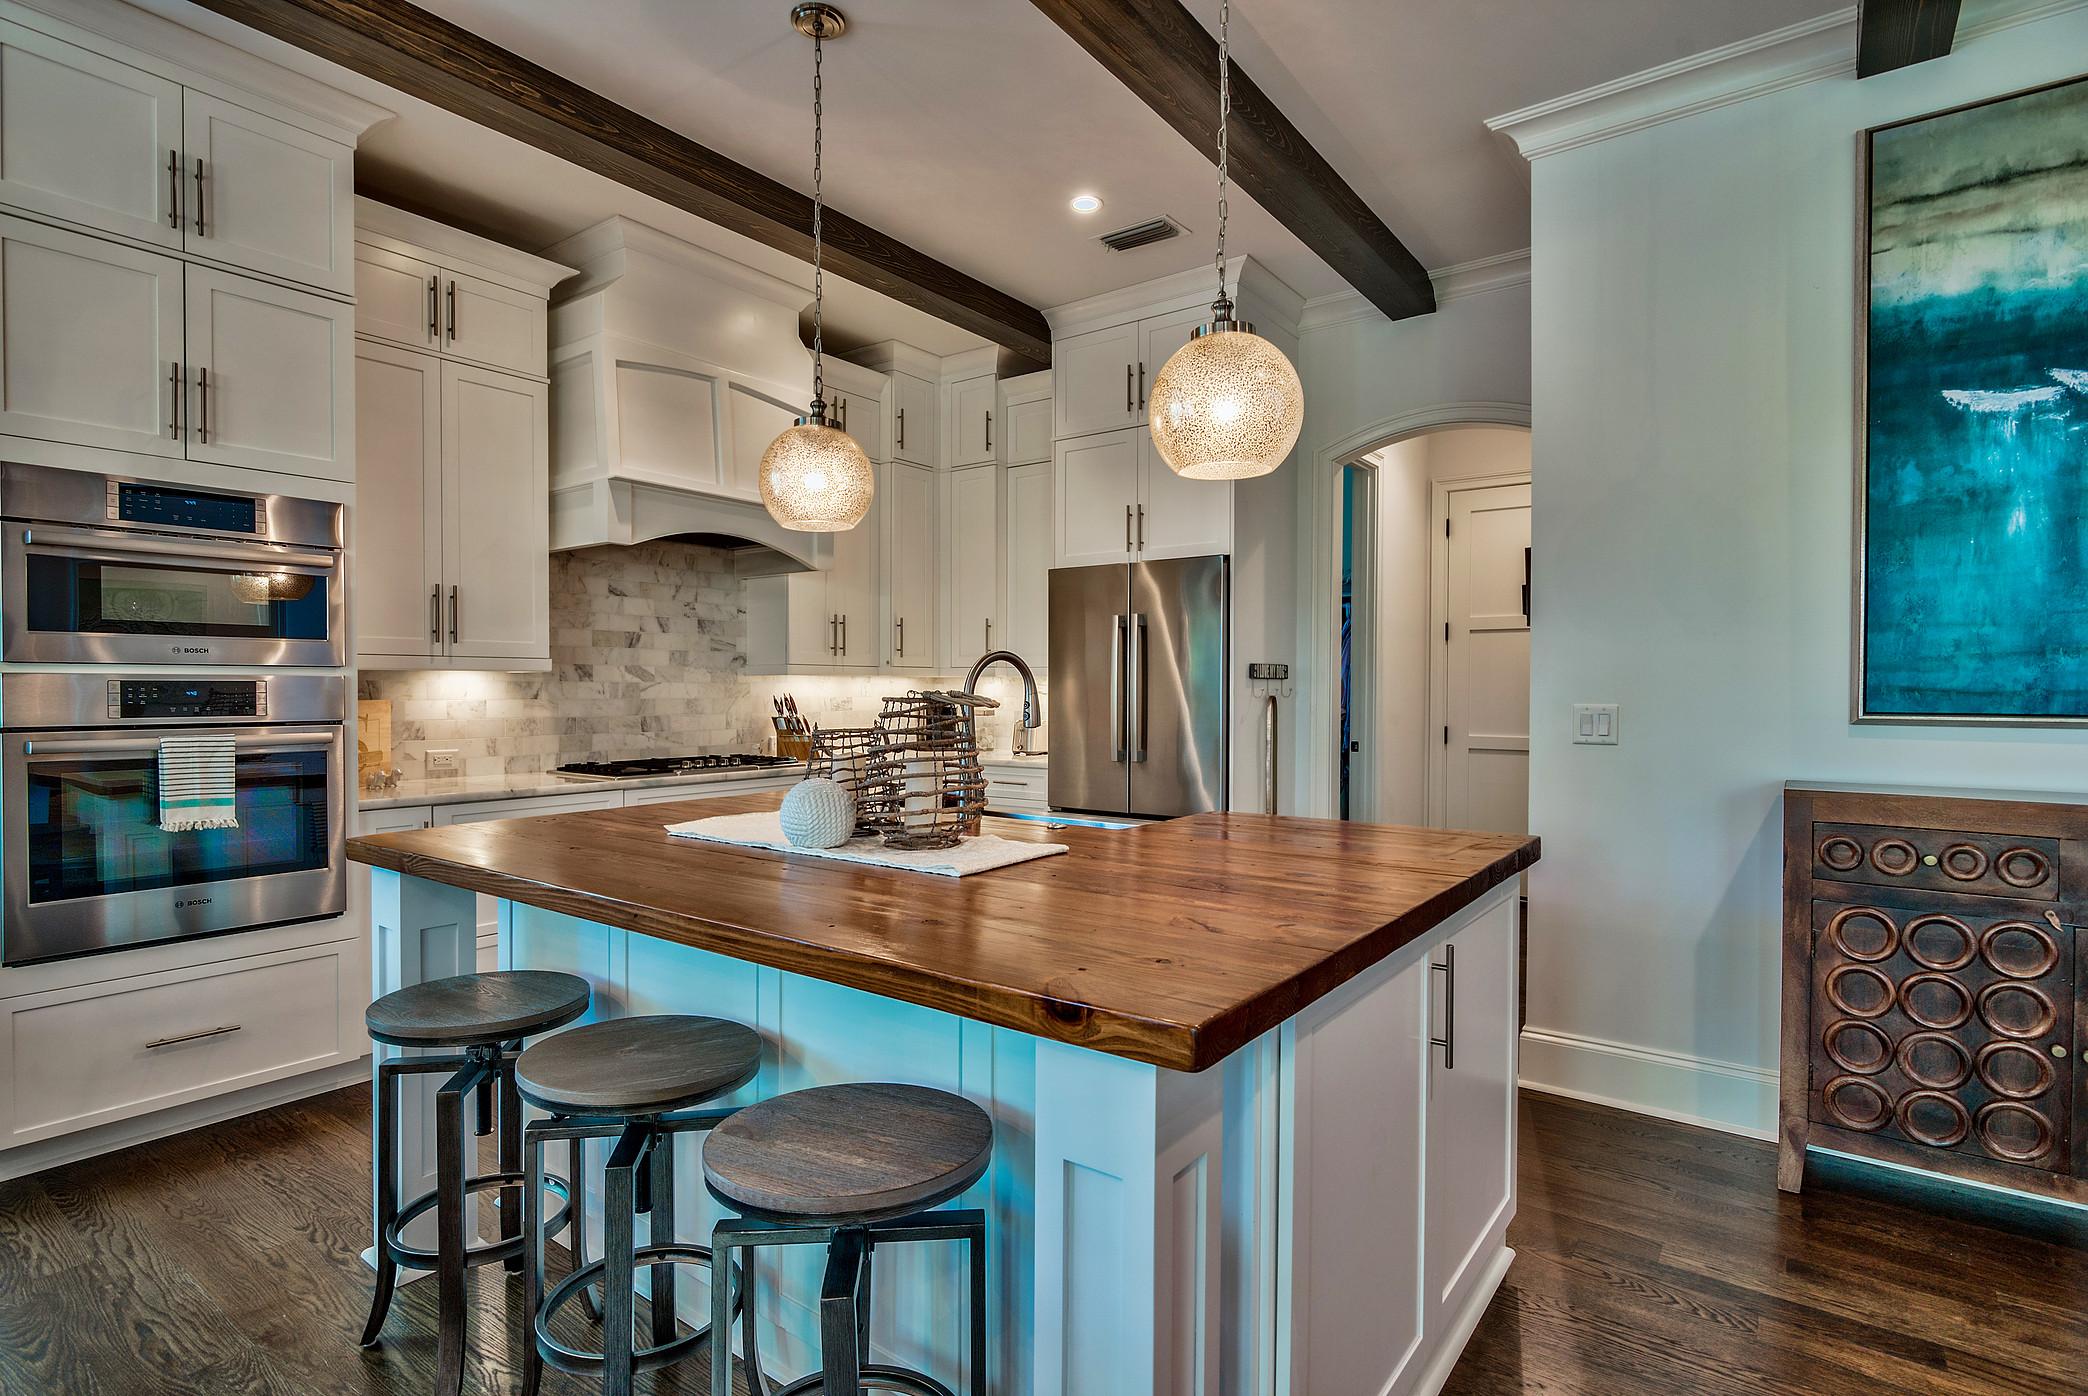 Custom Home with Exposed Wood Beams, Wood Countertop and Hardwood Flooring.